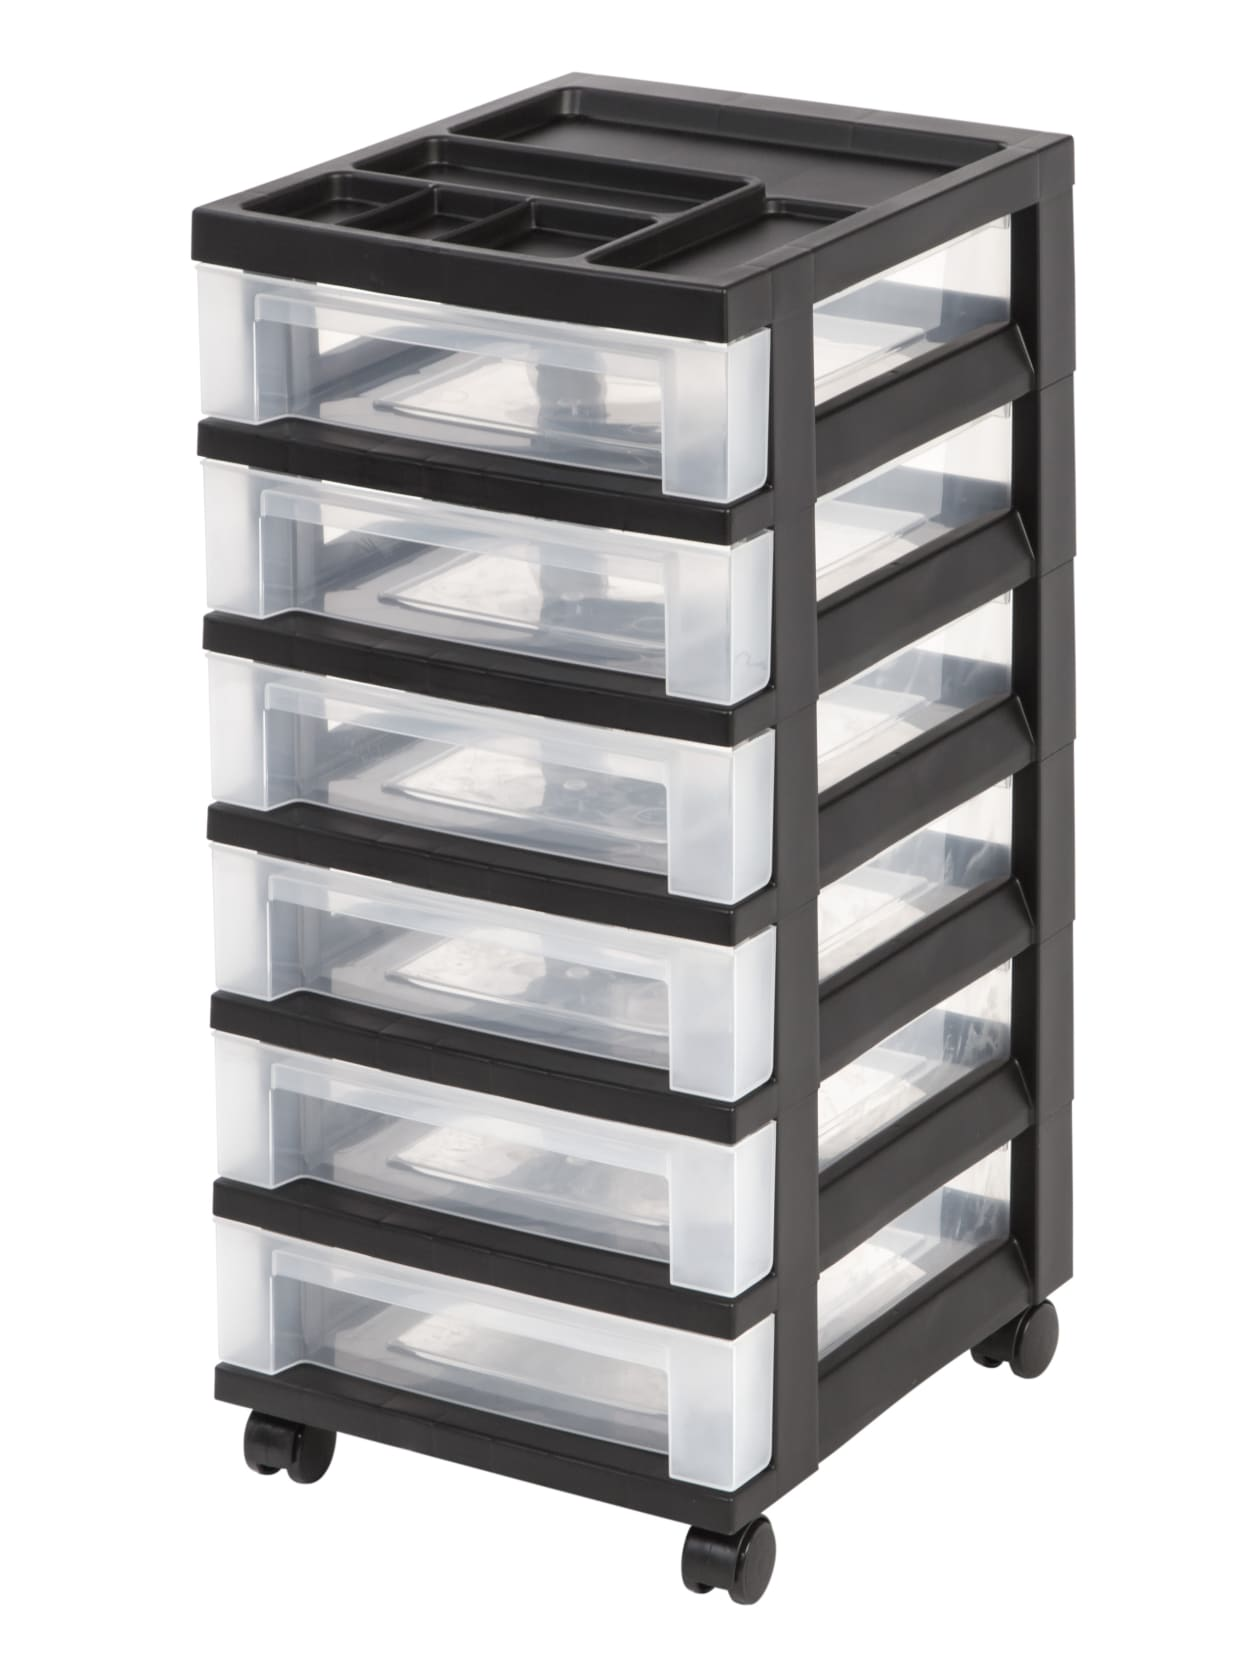 Office Depot Brand Plastic Storage Cart 40 Drawers 240 7140 H x 40